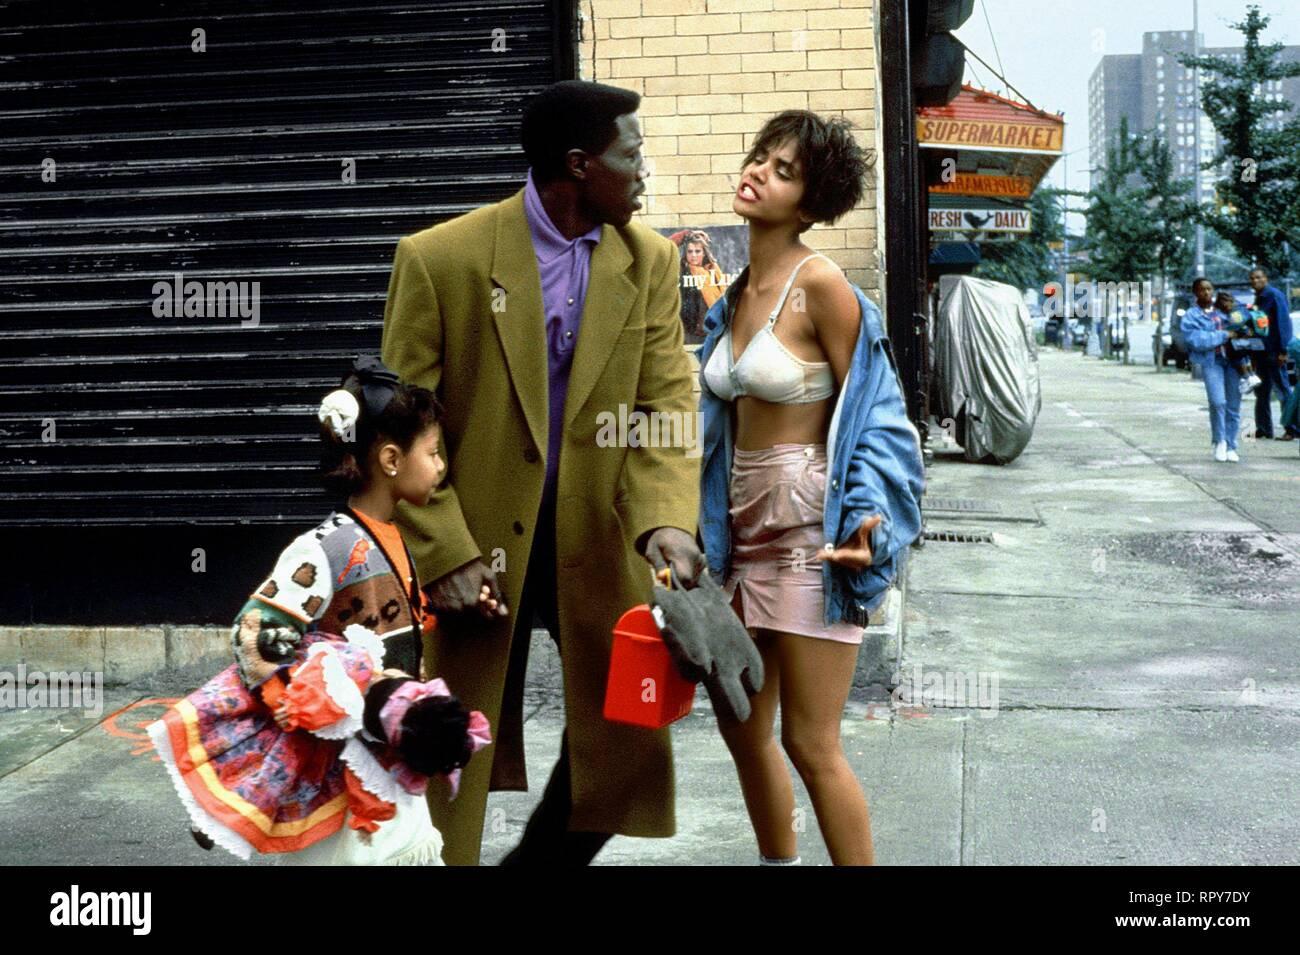 SNIPES,BERRY, JUNGLE FEVER, 1991 Stock Photo